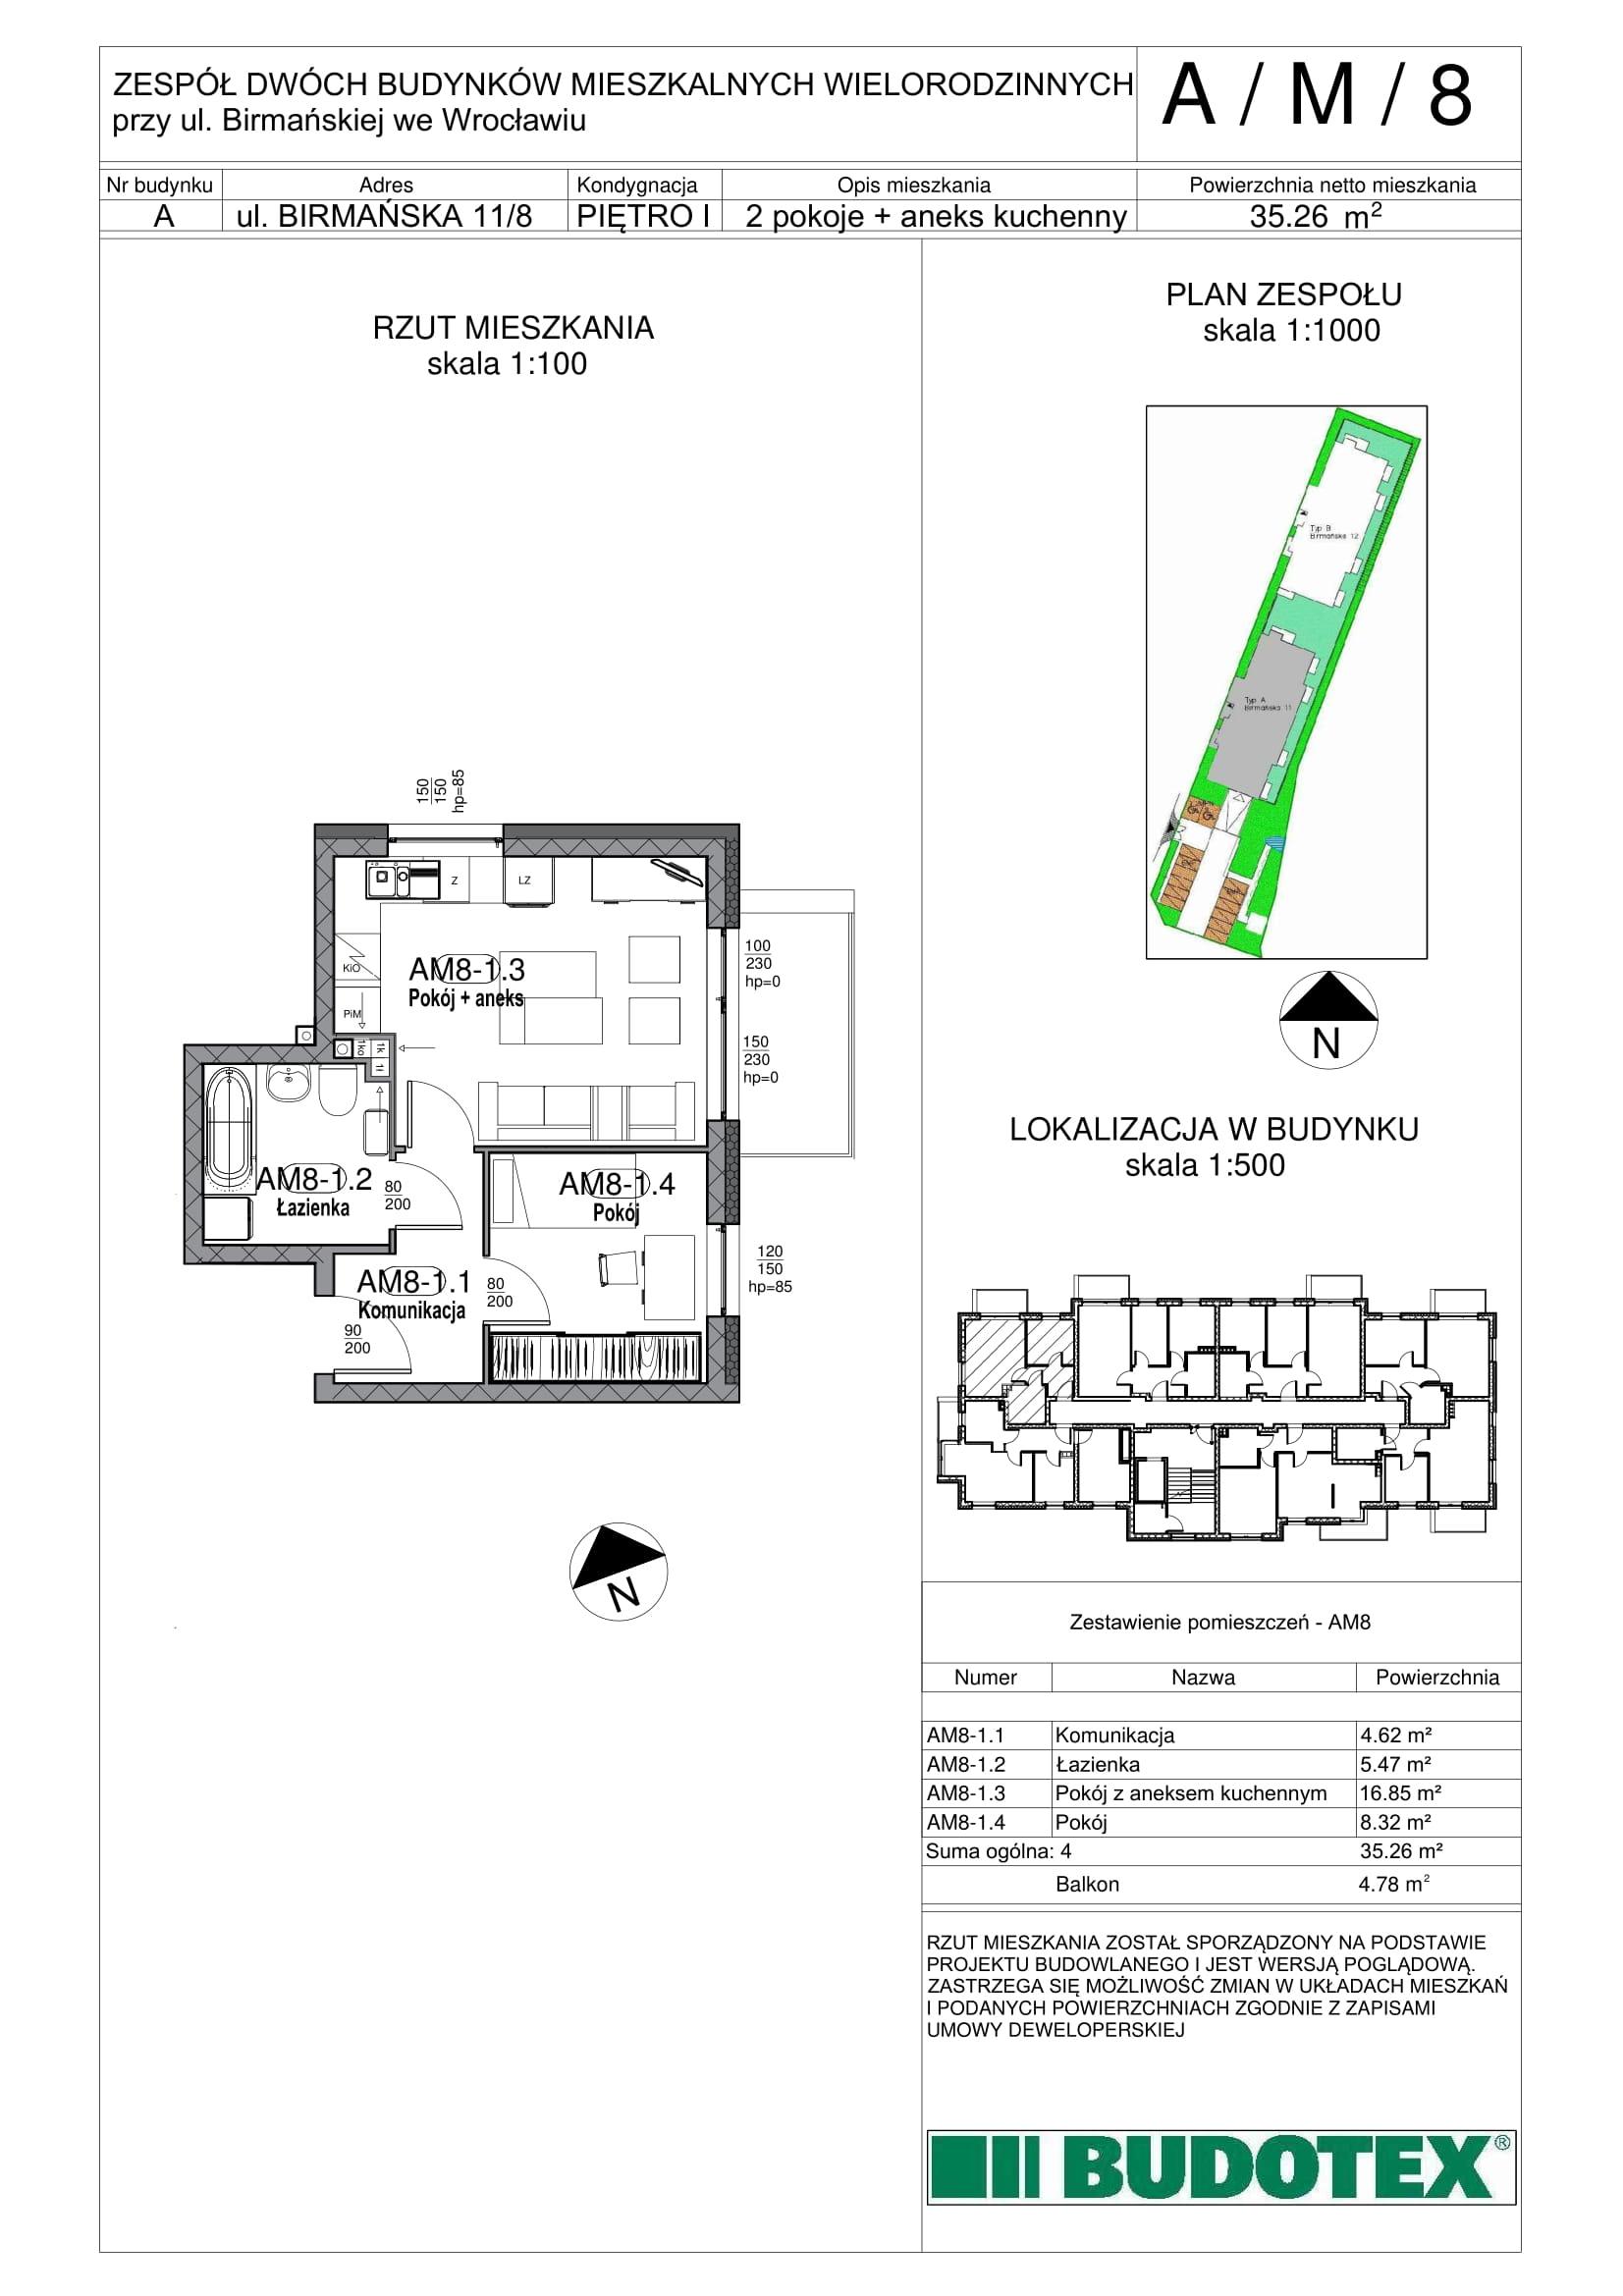 Mieszkanie nr A/M/08